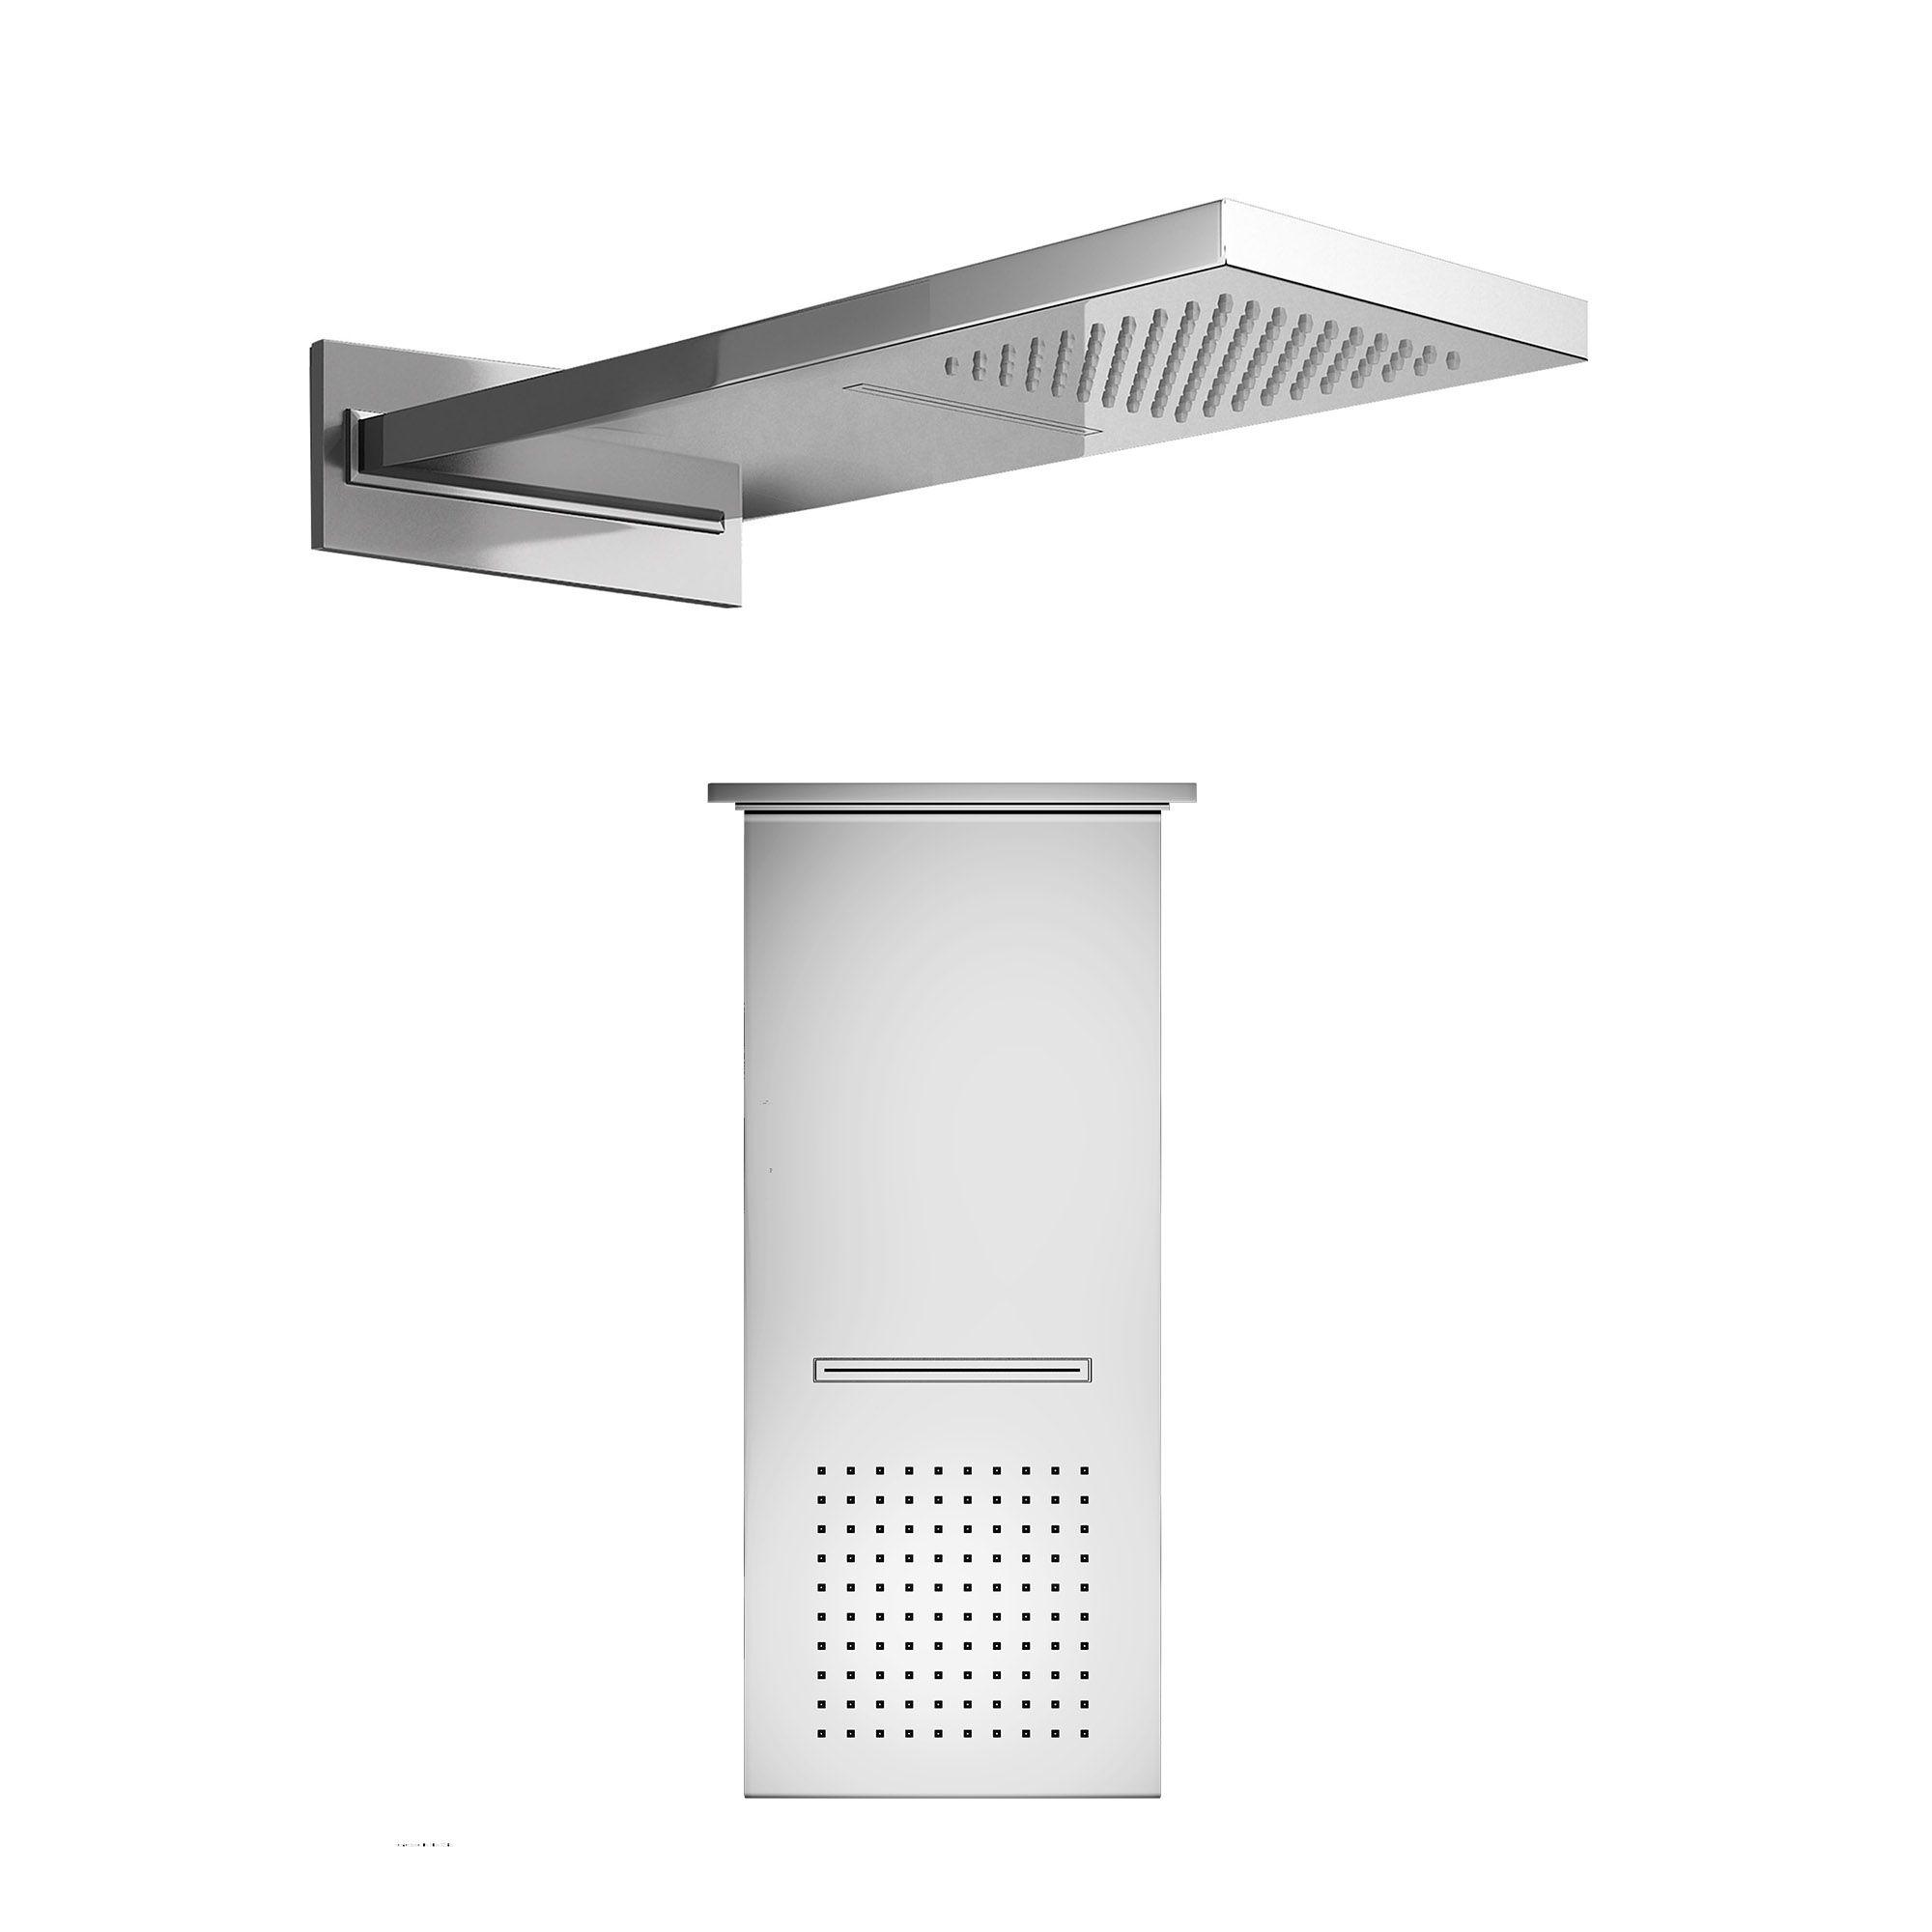 Pin by M&M\'s on + TEXTURES | Pinterest | Mixer shower, Modern shower ...